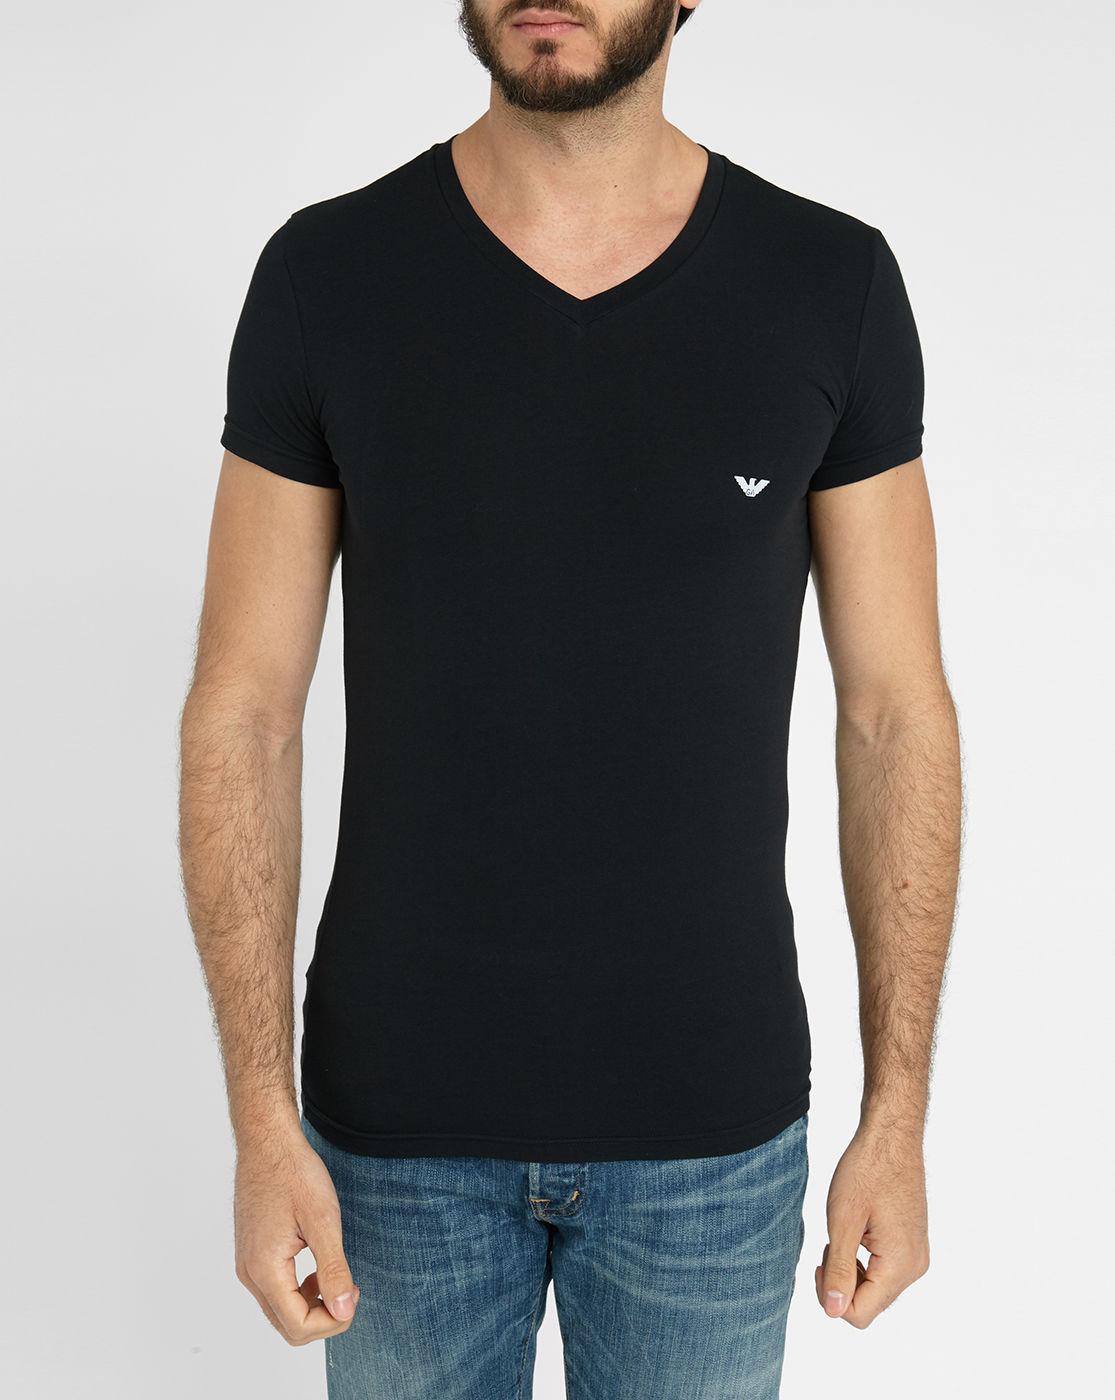 Emporio Armani Black Short Sleeve V Neck Logo T Shirt In